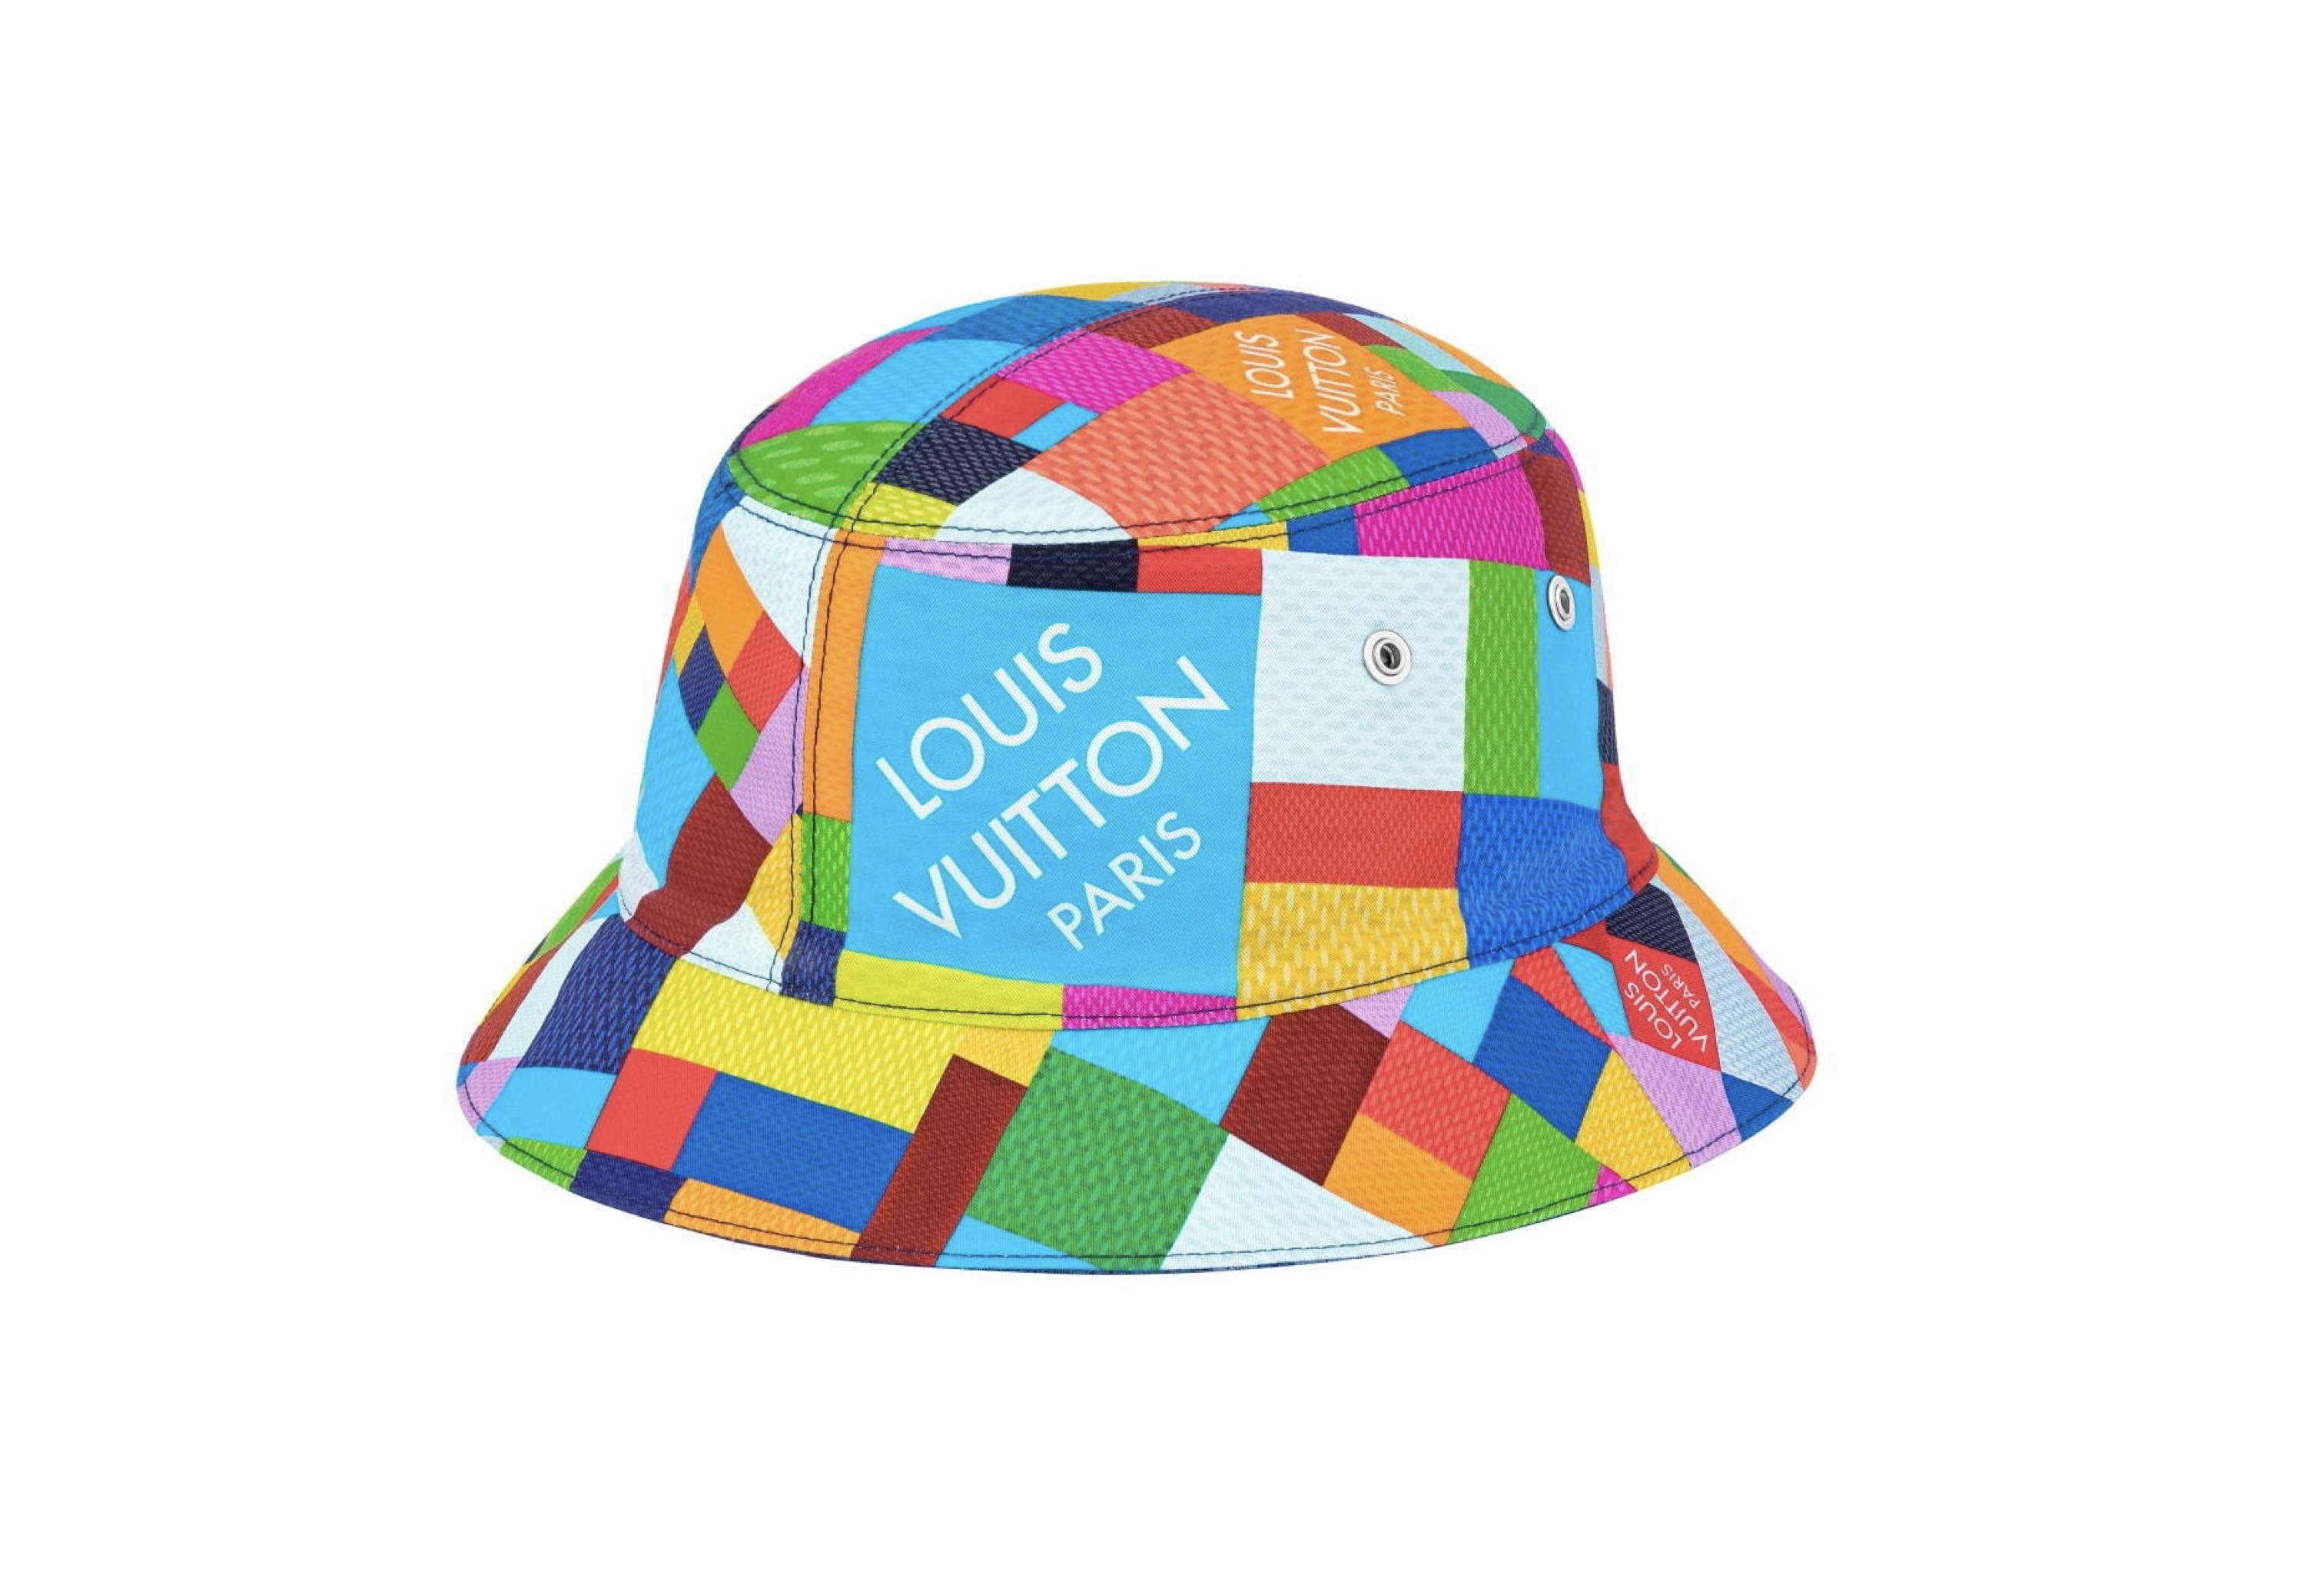 Louis Vuitton、新年を彩る新作メンズアクセサリーコレクション発売